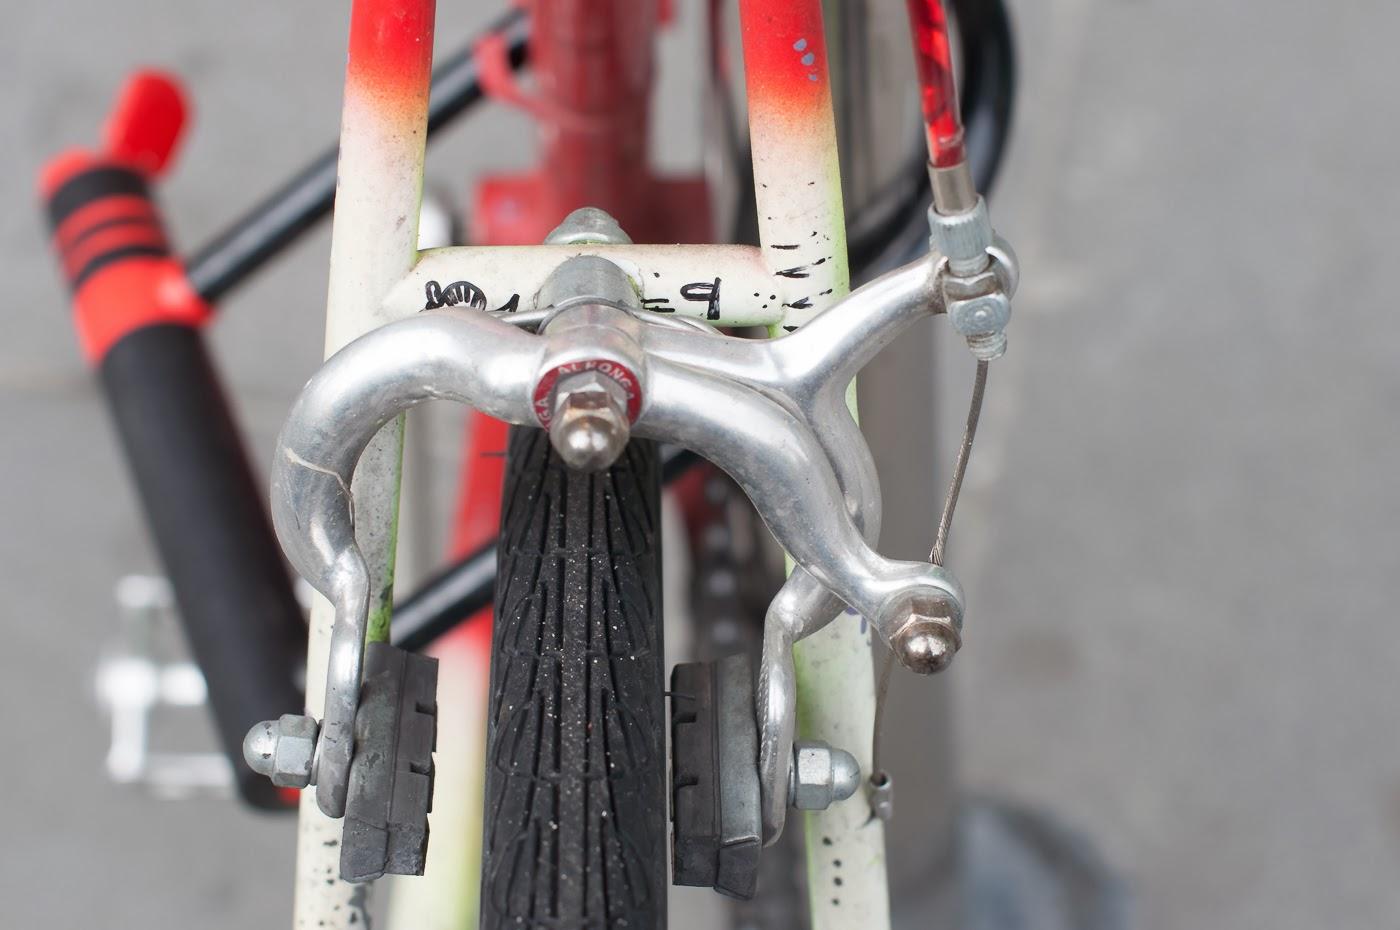 Pub bike, bike, bicycle, conversion, road bike, tim macauley, the biketorialist, Melbourne, Australia, swanston st, rear brake, side pull, brake